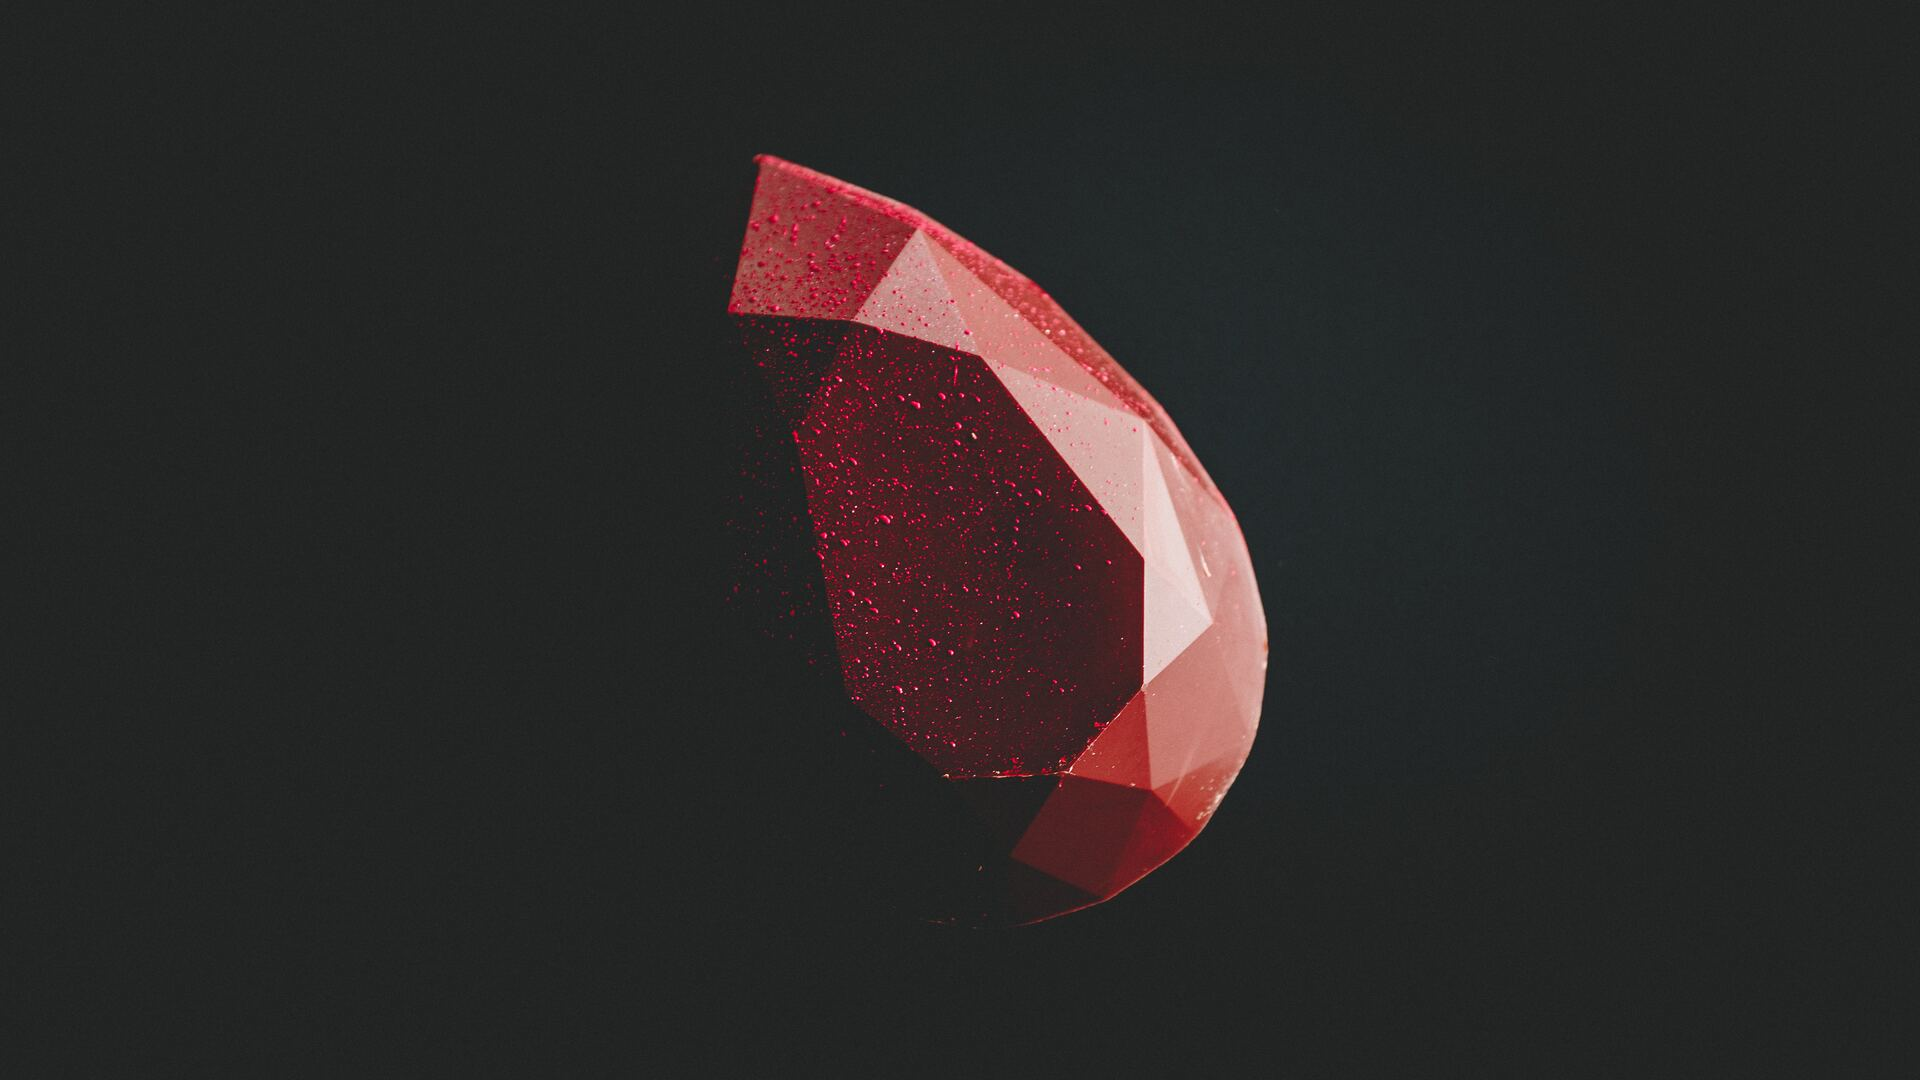 1920x1080 Red Diamond Minimal Dark 5k Laptop Full Hd 1080p Hd 4k